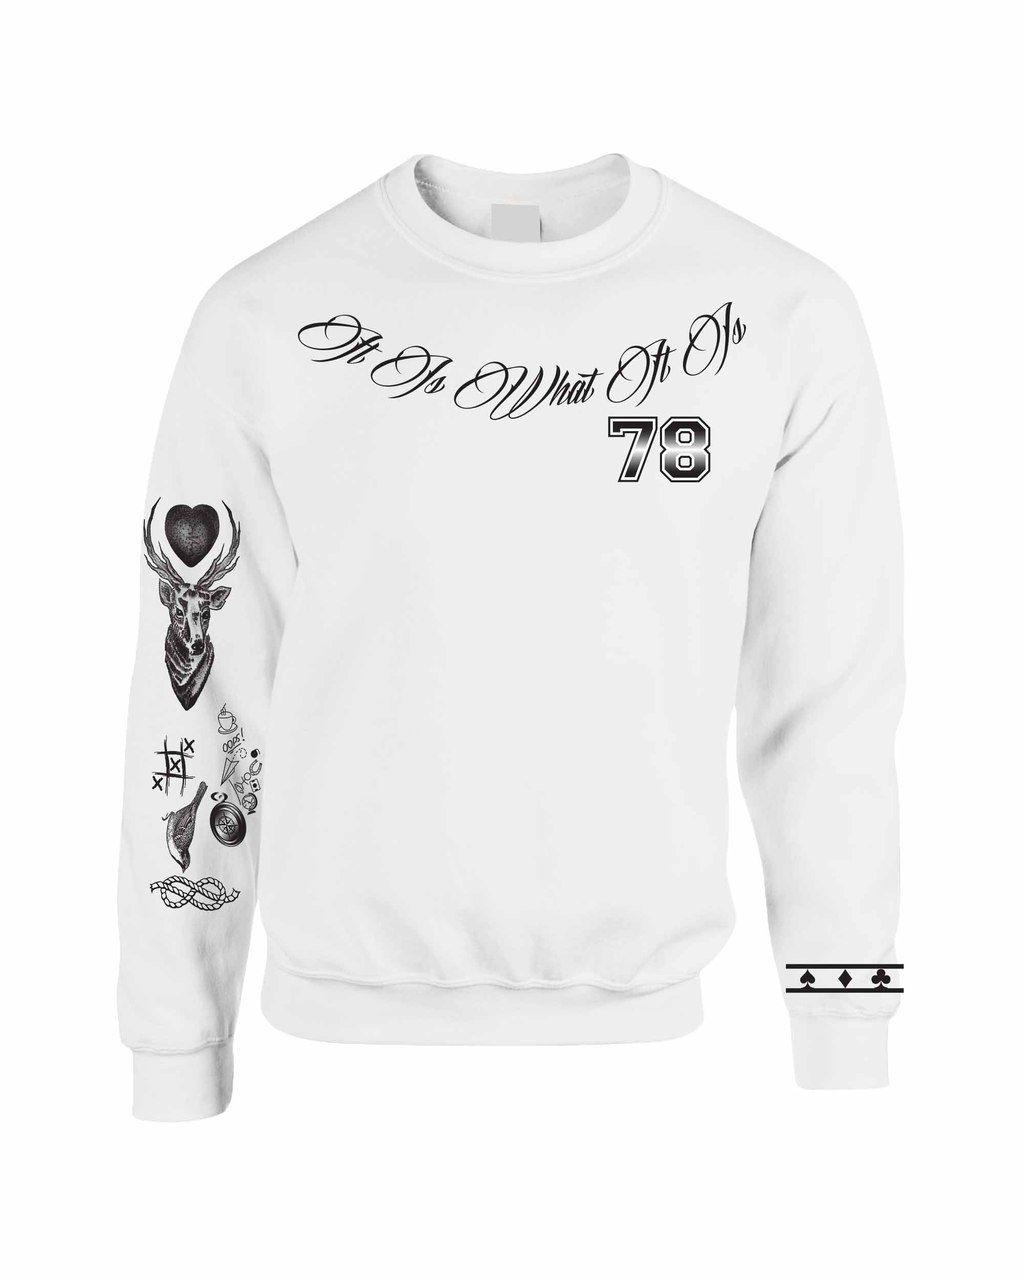 LOUIS TOMLINSON body Tattoo Sweatshirt One Direction